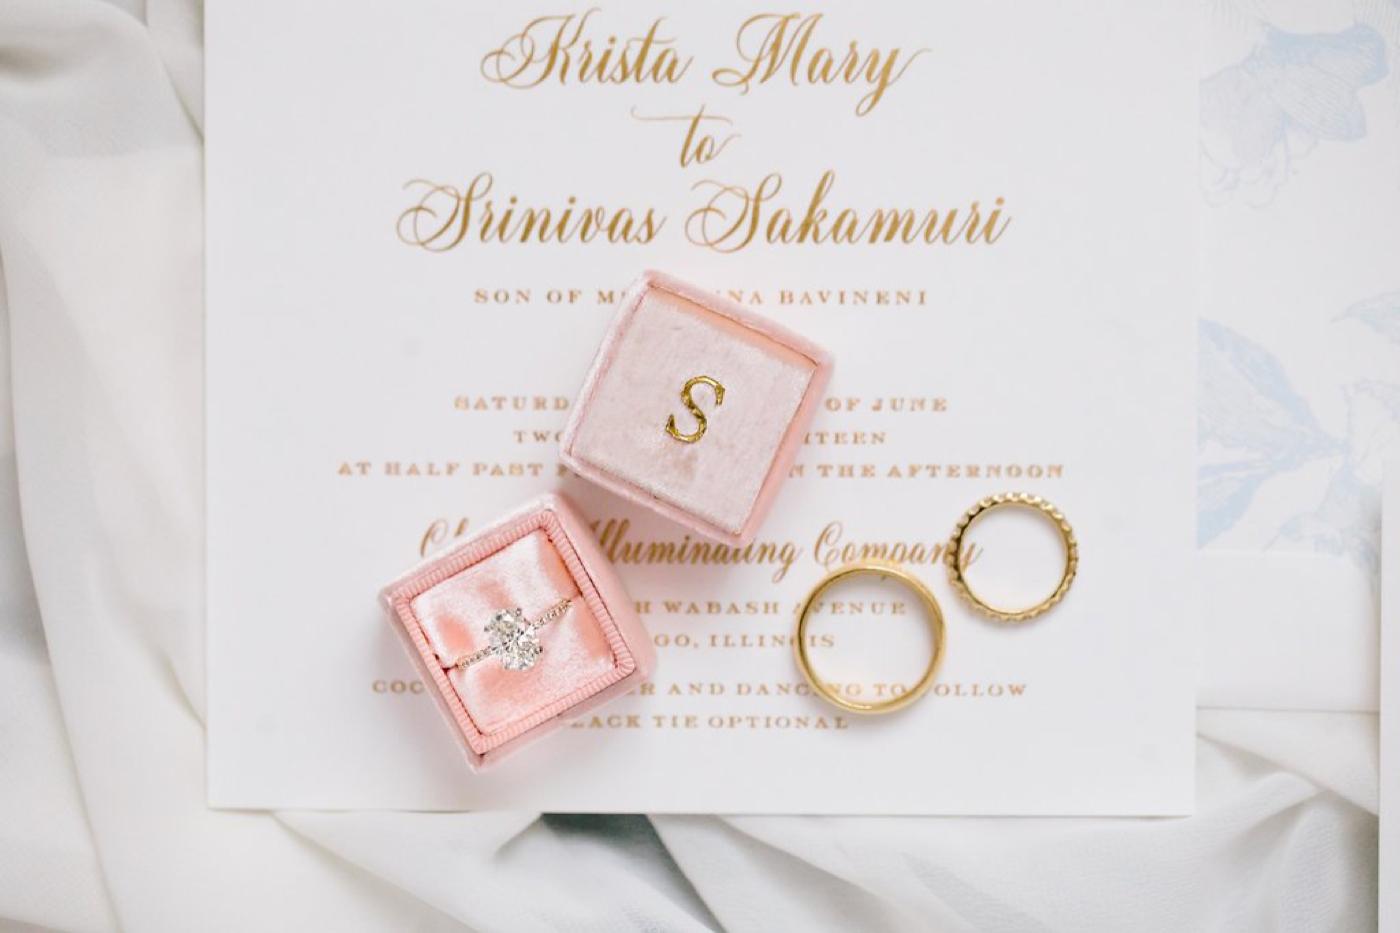 chicago-fine-art-wedding-photography-sakamuri5